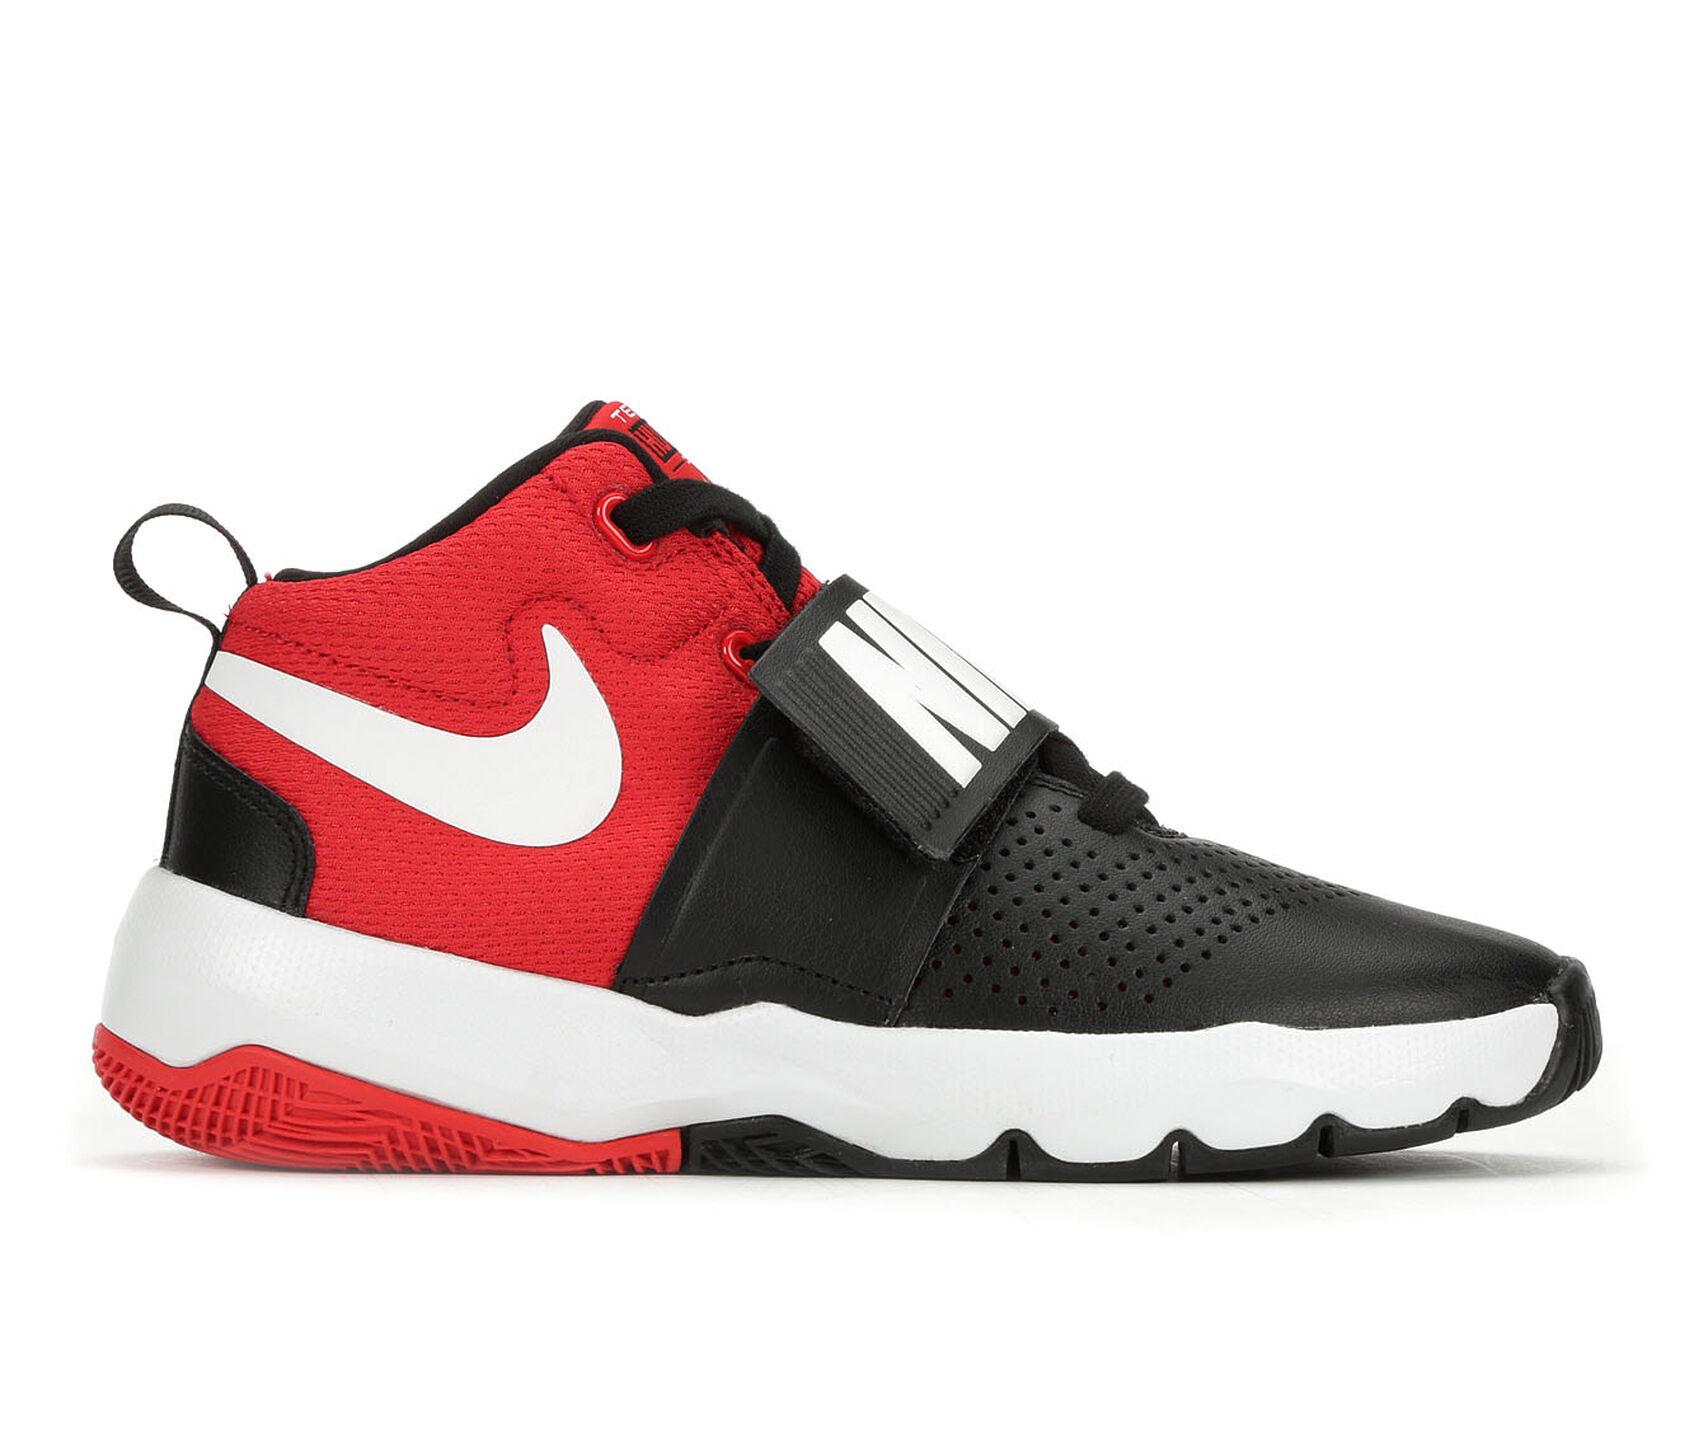 fafb3e8ac3 Boys' Nike Little Kid Team Hustle D8 High Top Basketball Shoes